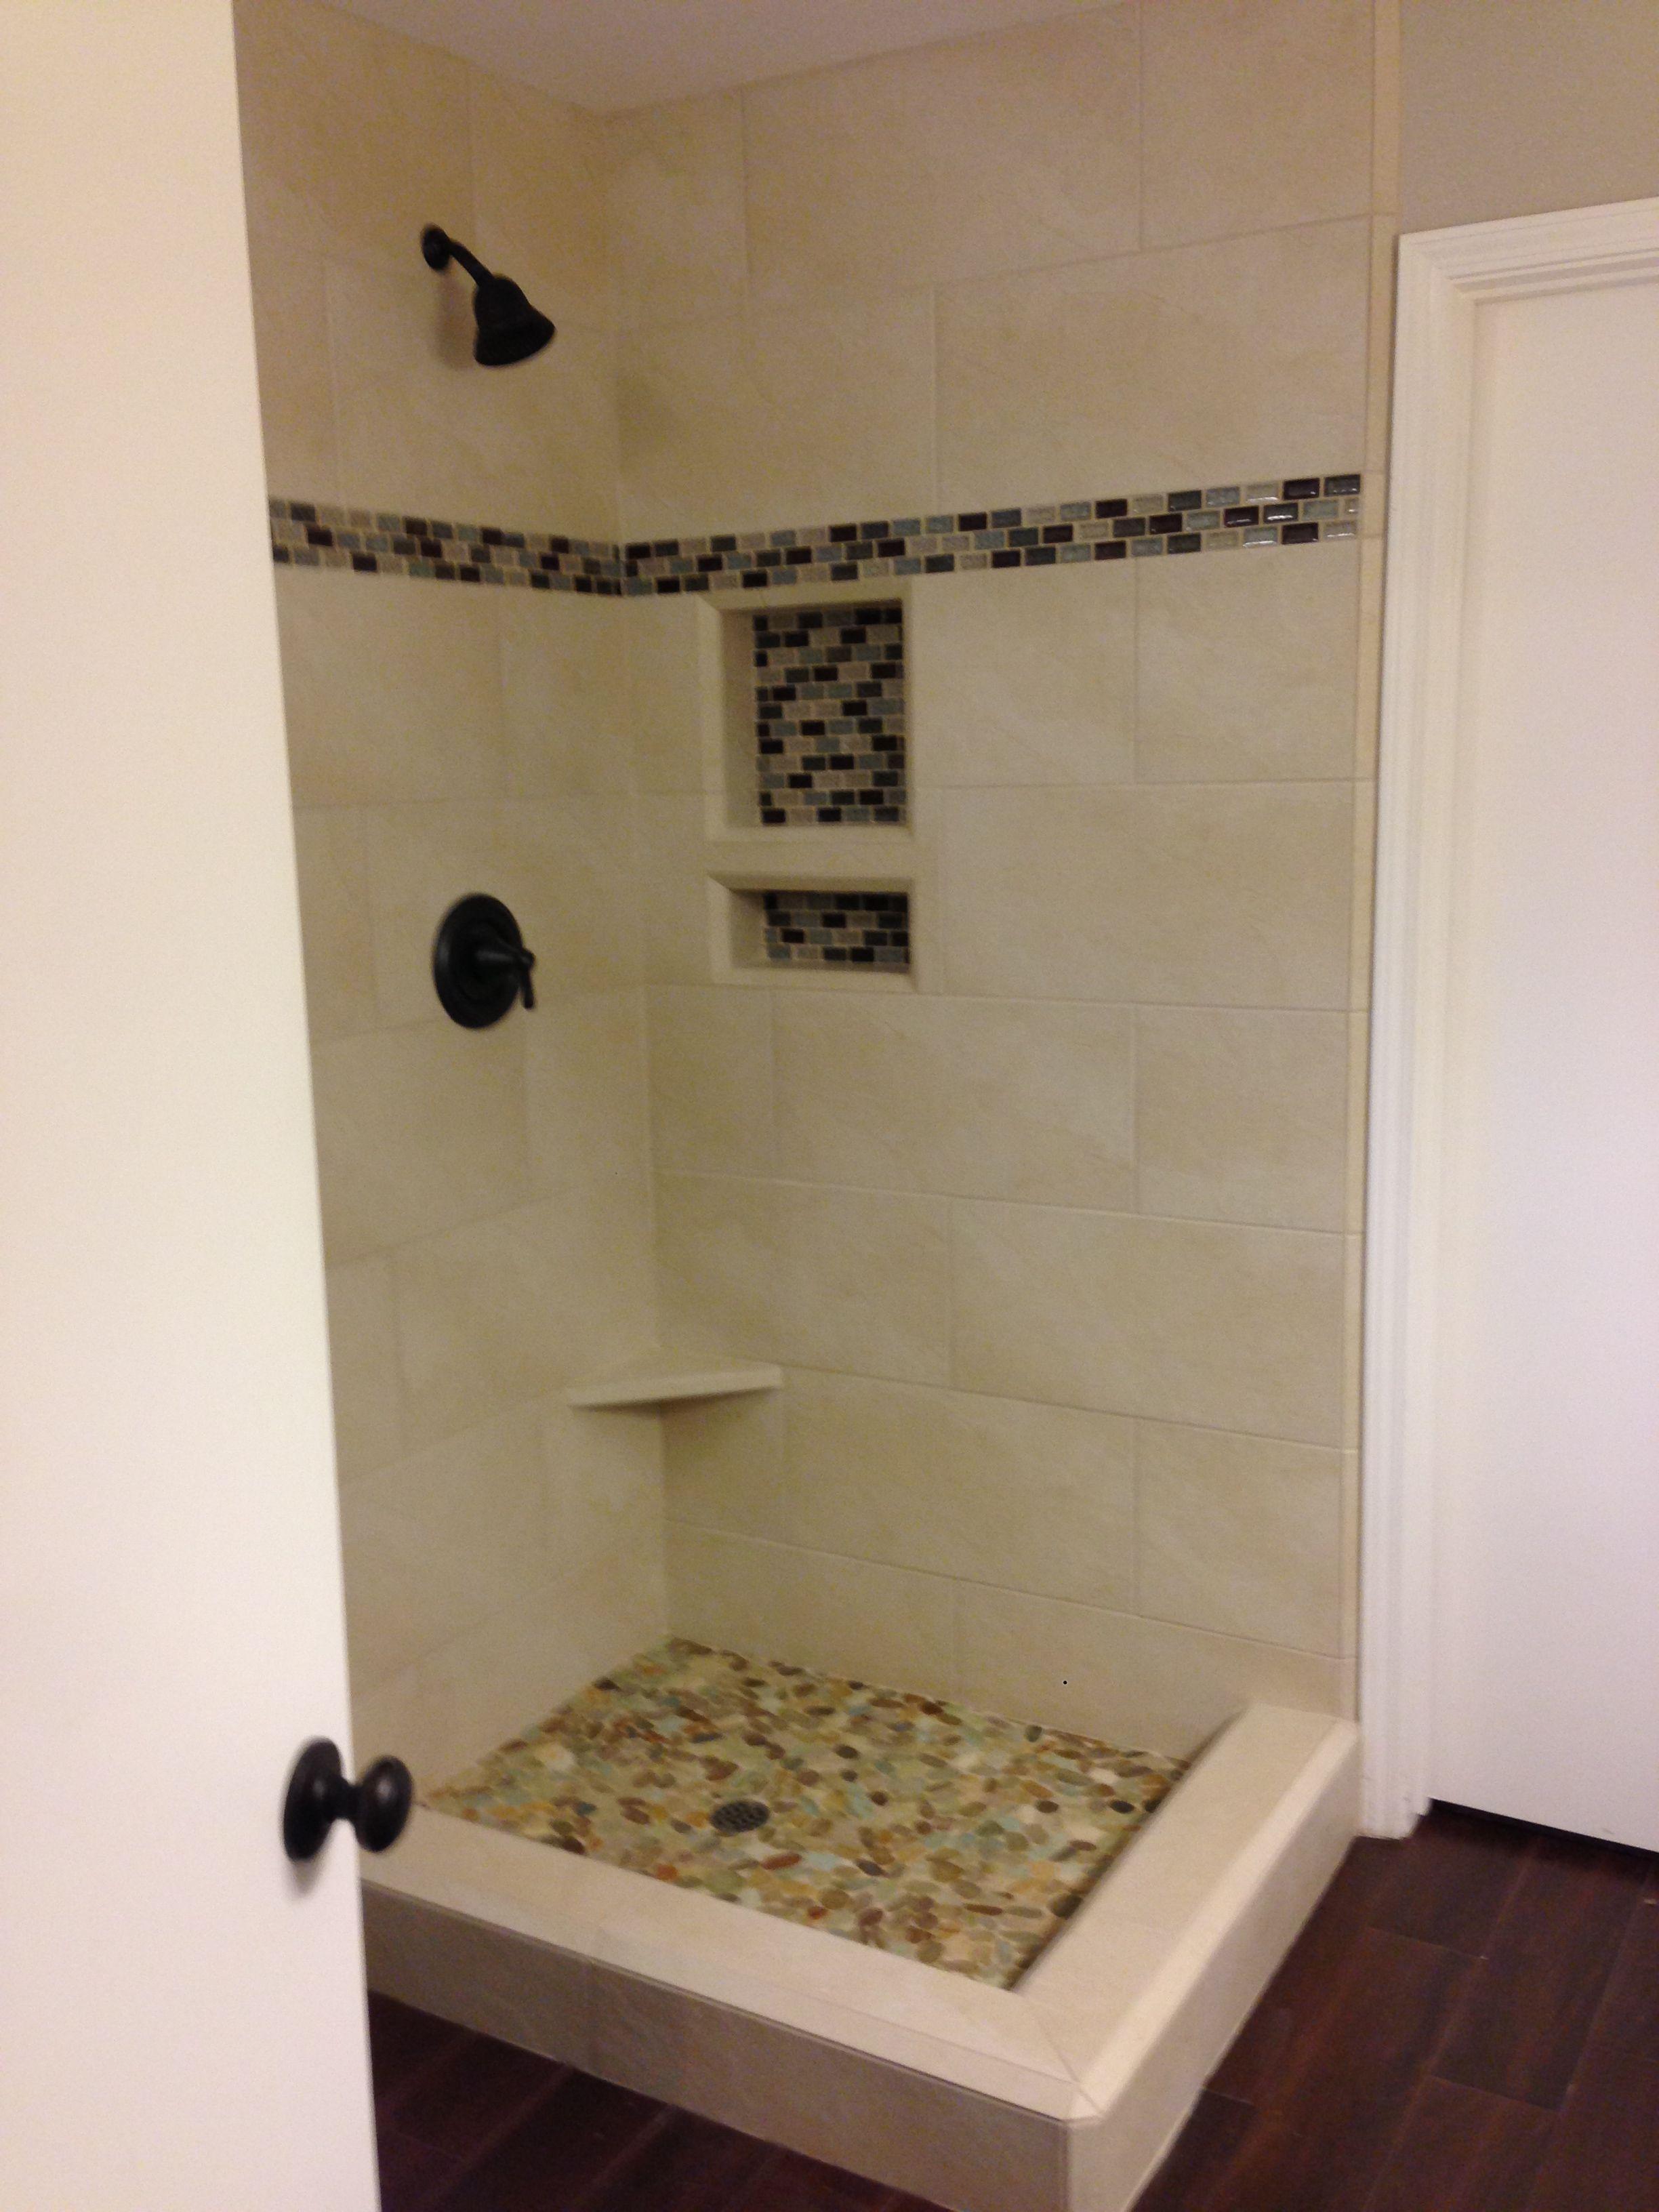 sarah aya brackett tile an bathroom made artist start floor week mosaic myers to glass ti the of finish photo by